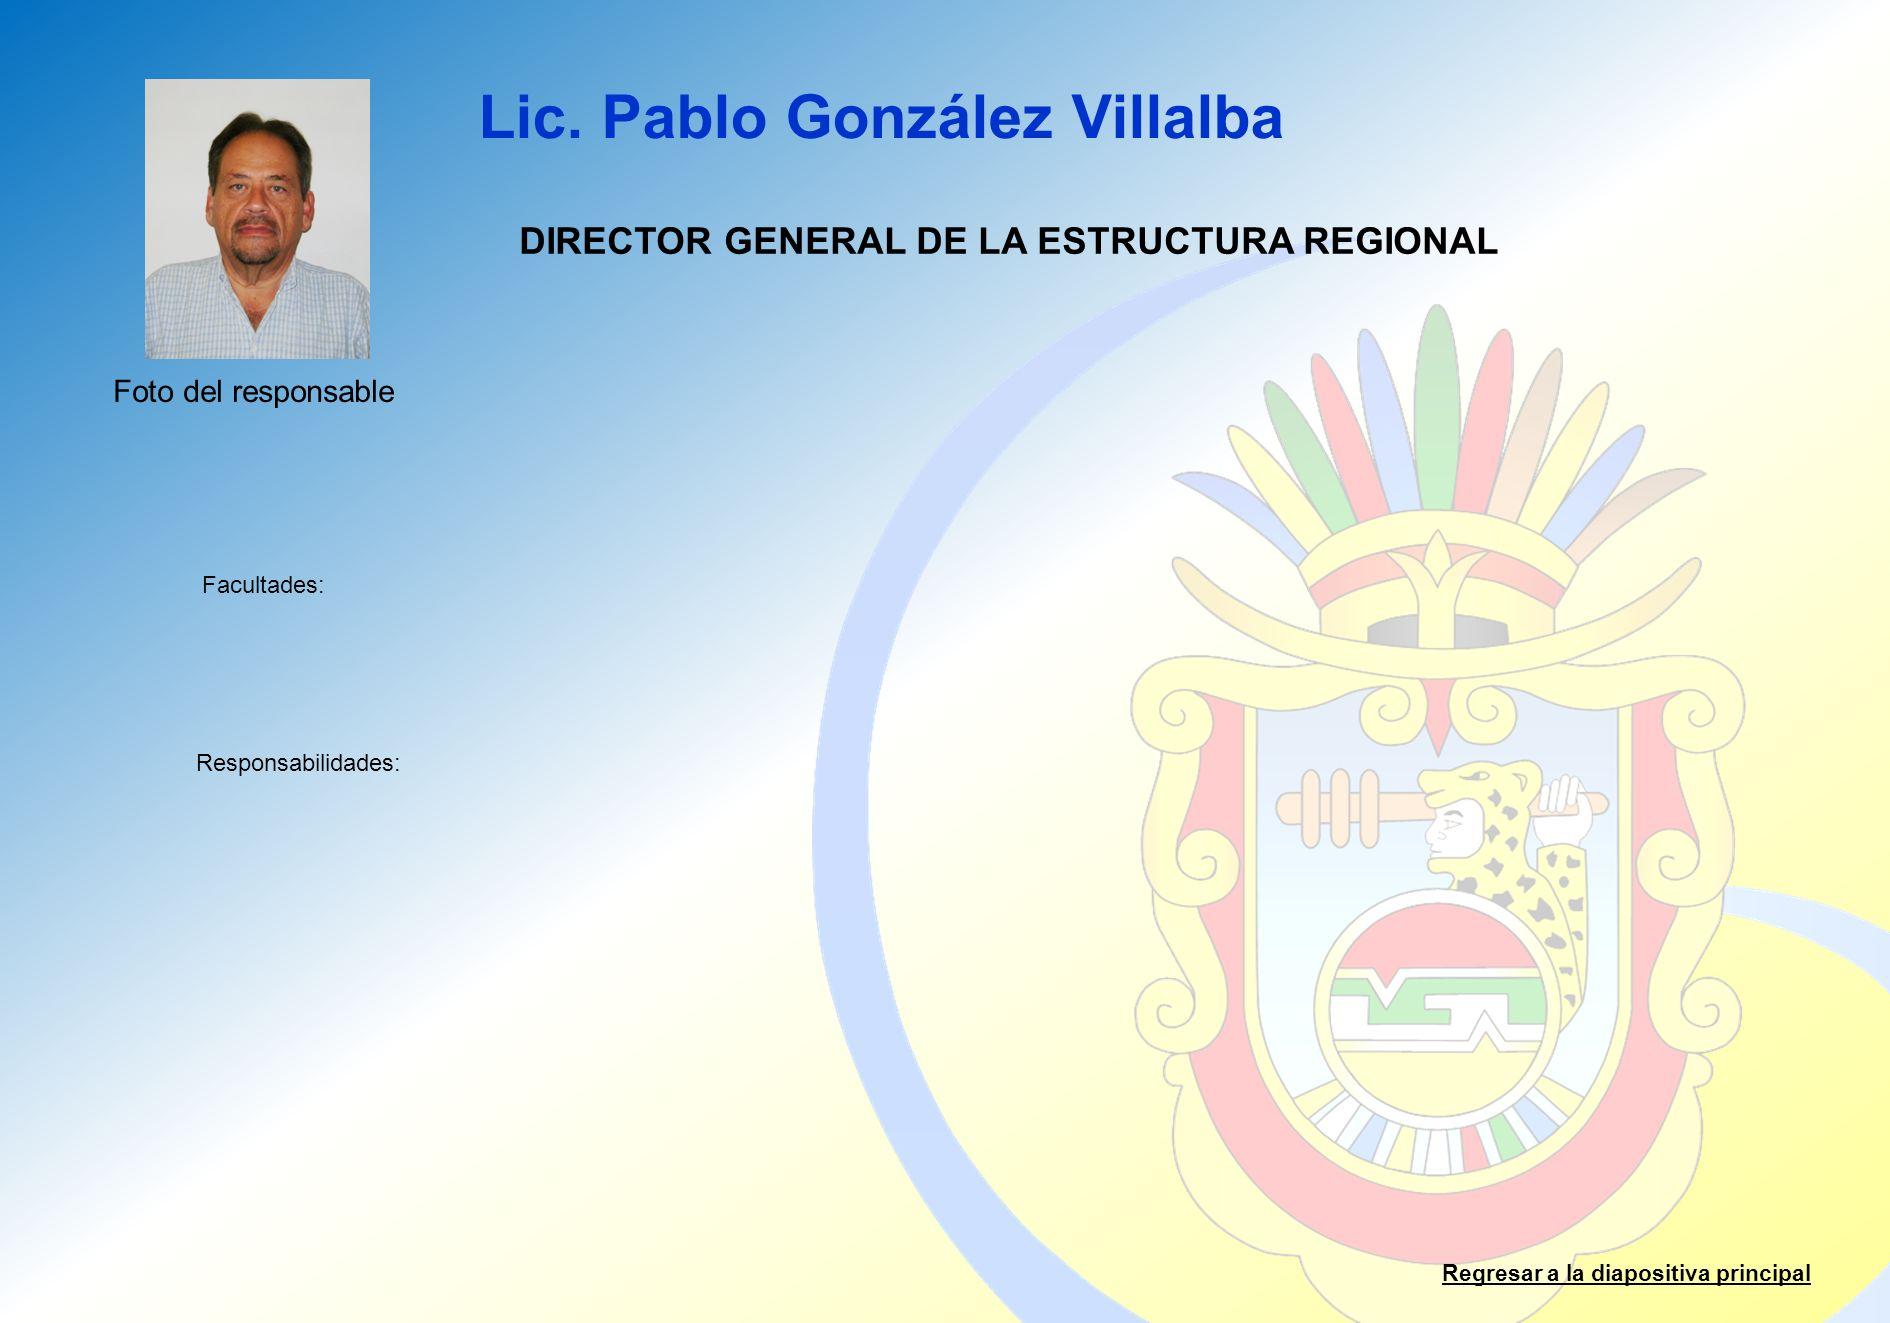 DIRECTOR GENERAL DE LA ESTRUCTURA REGIONAL